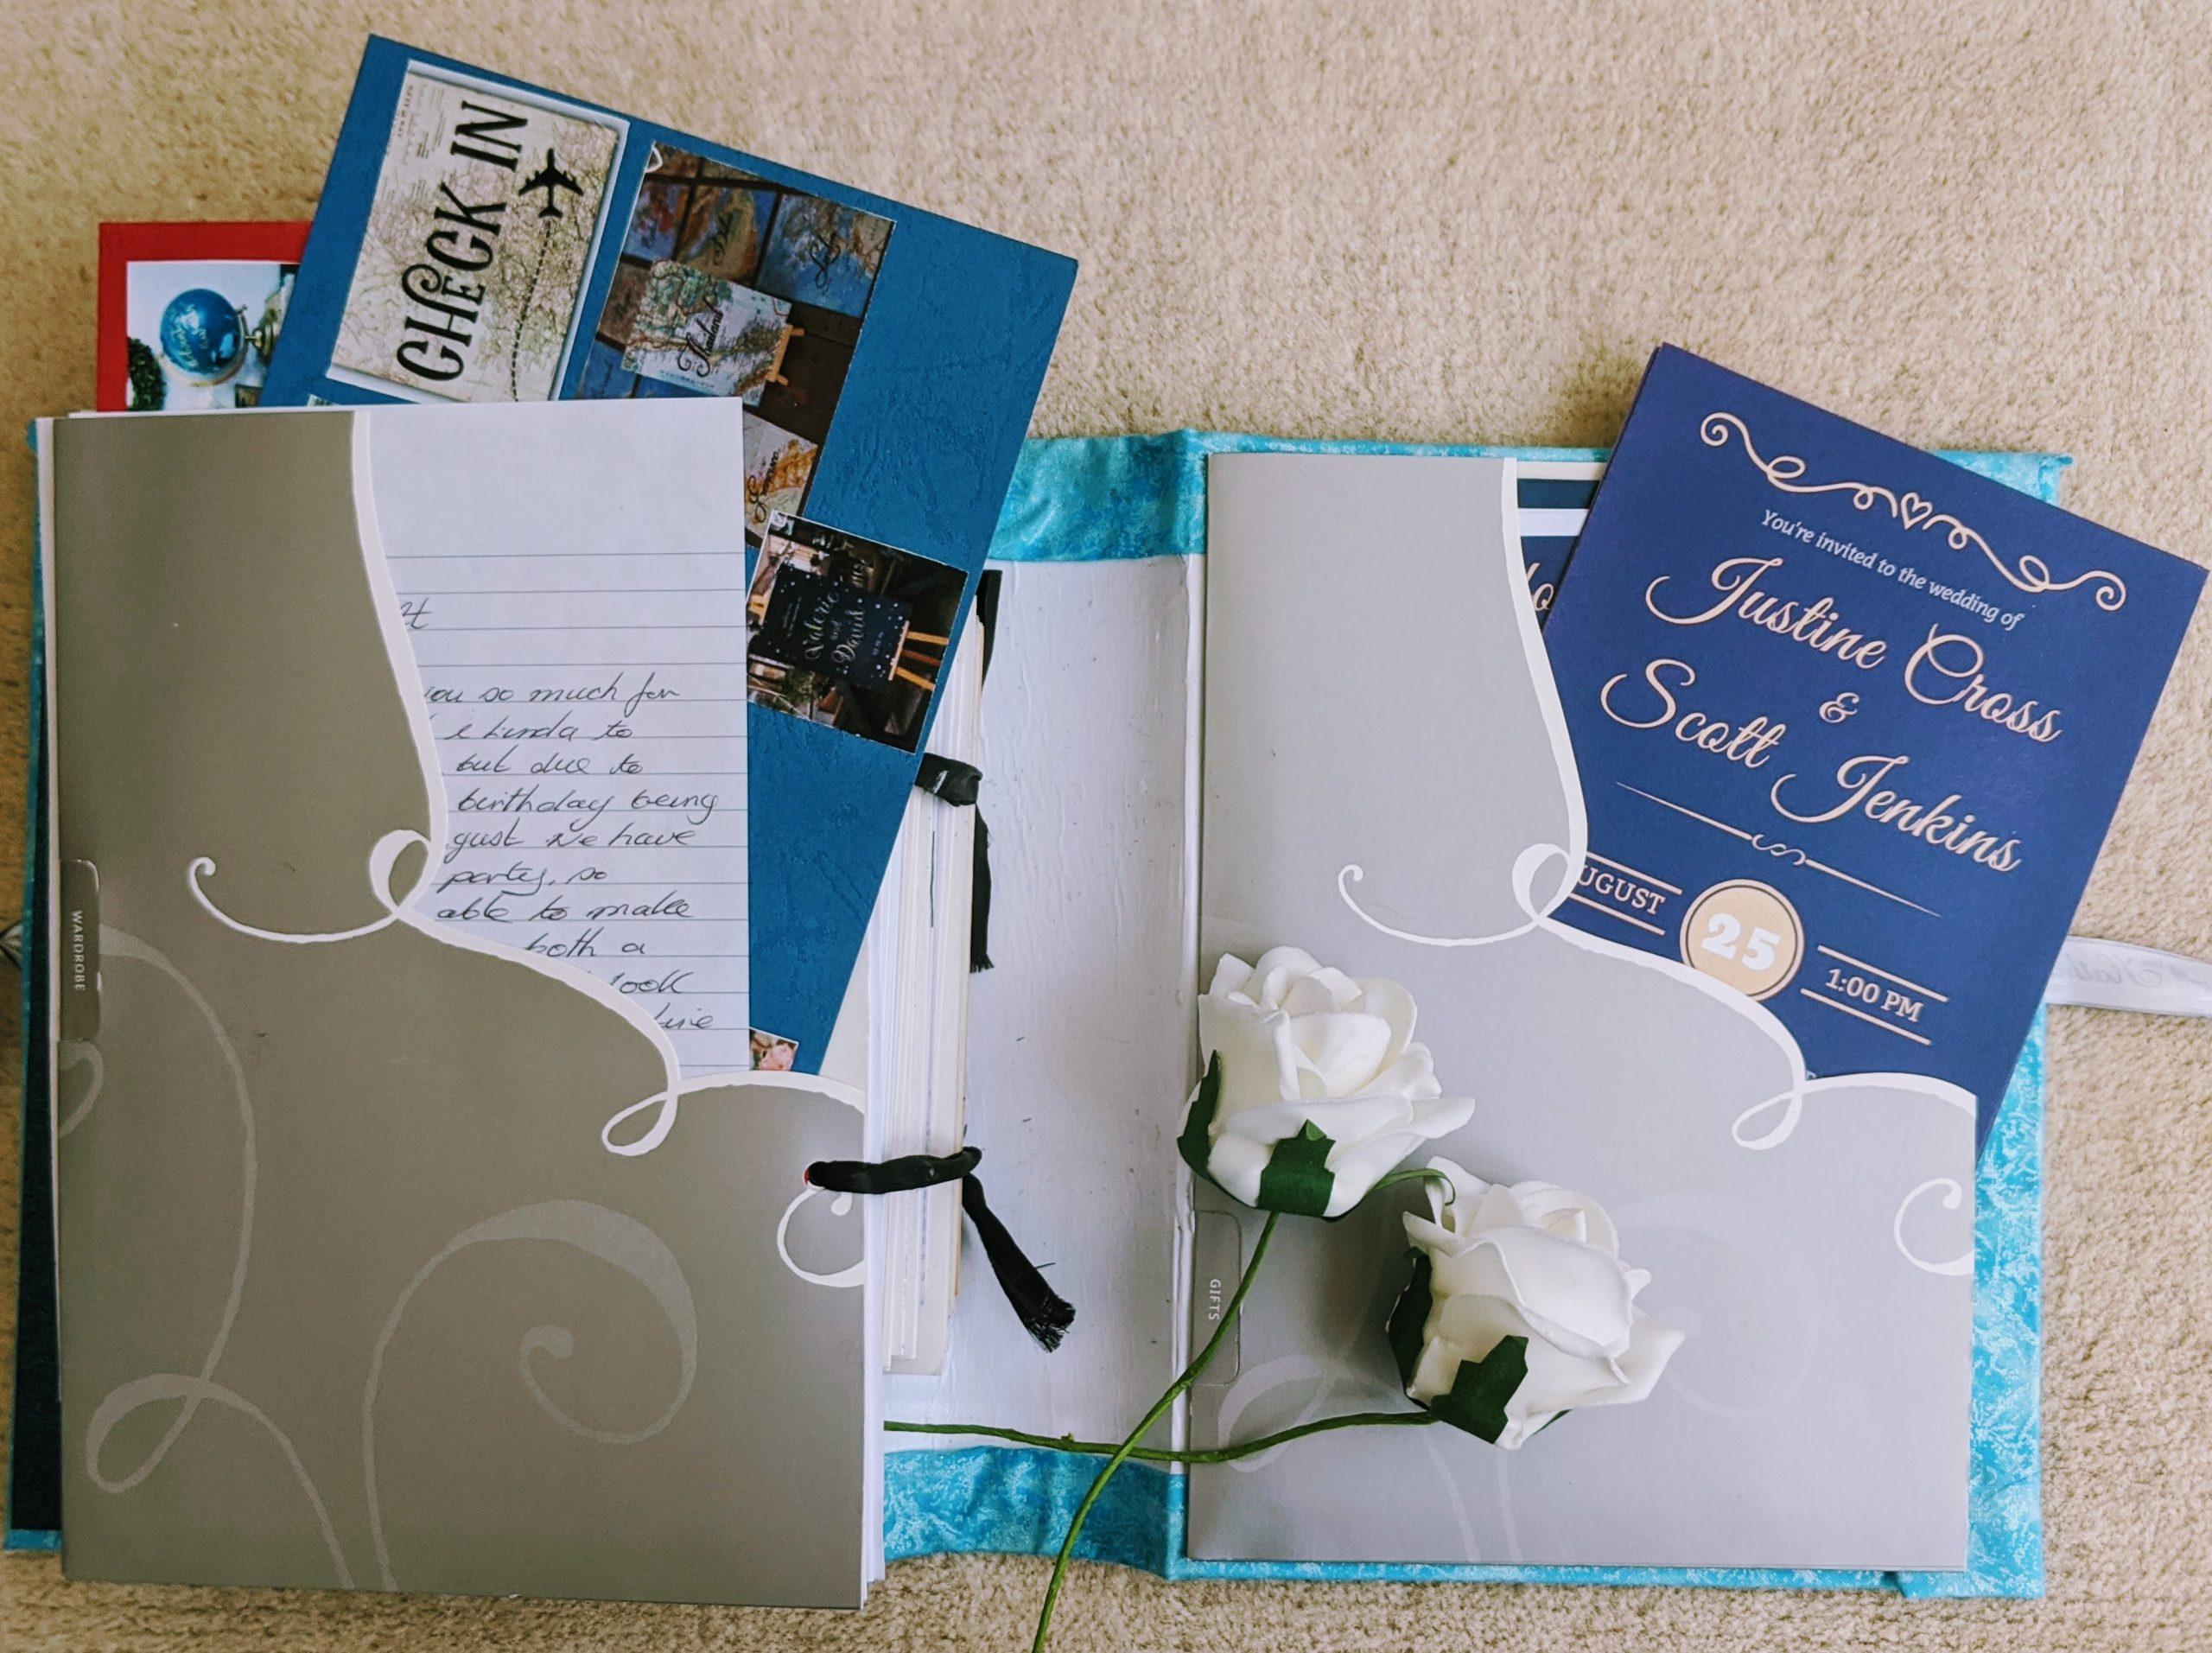 Our wedding invitations inside our wedding card keepsake